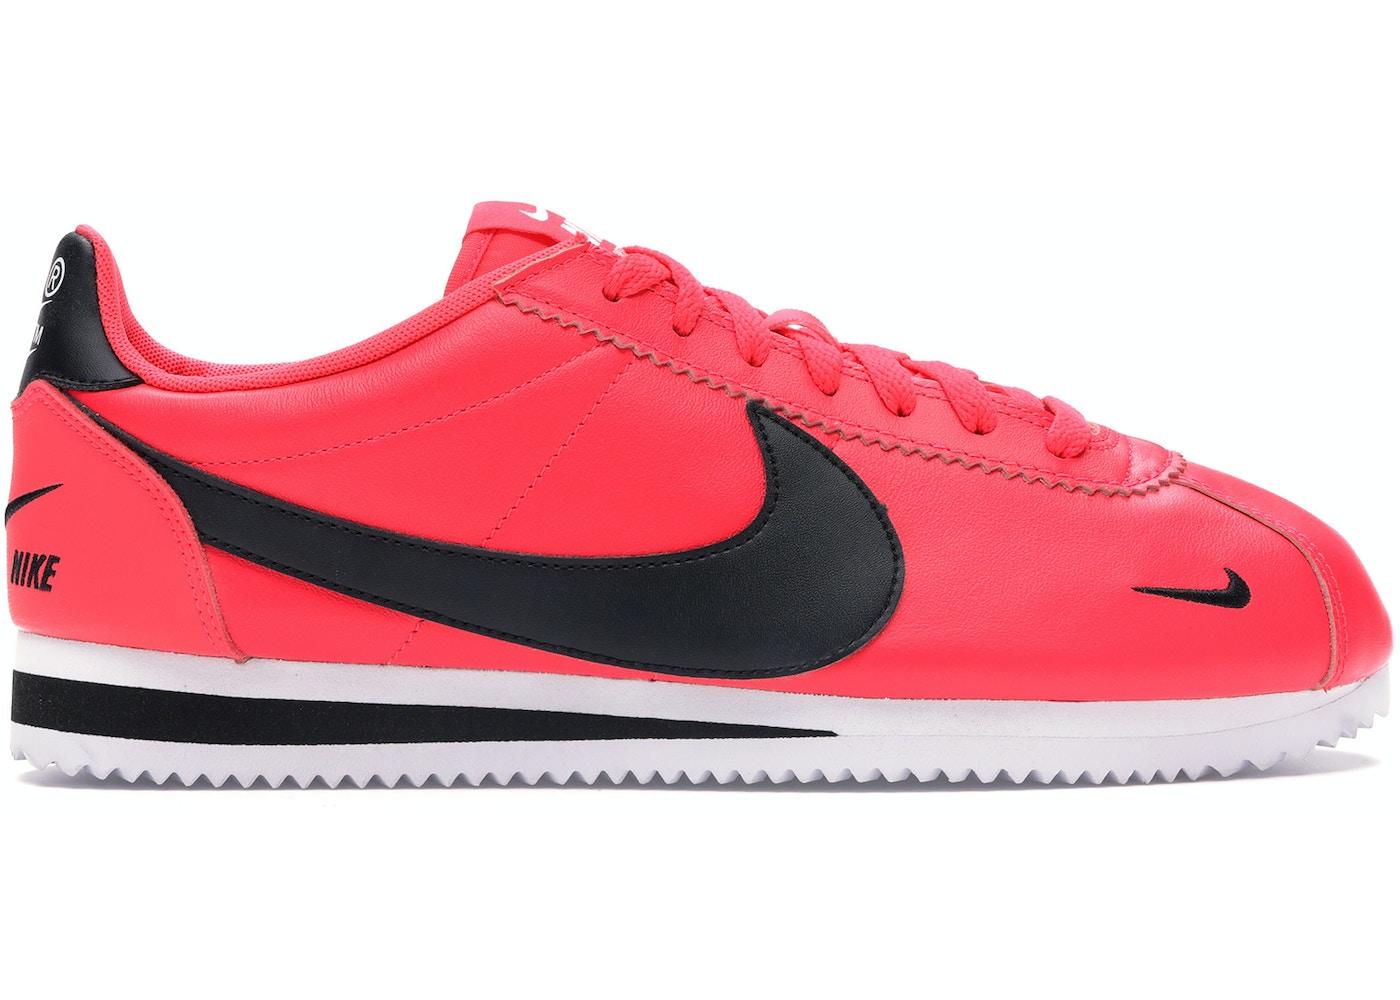 pretty nice d08e4 d0828 Nike Classic Cortez Overbranding Red Orbit